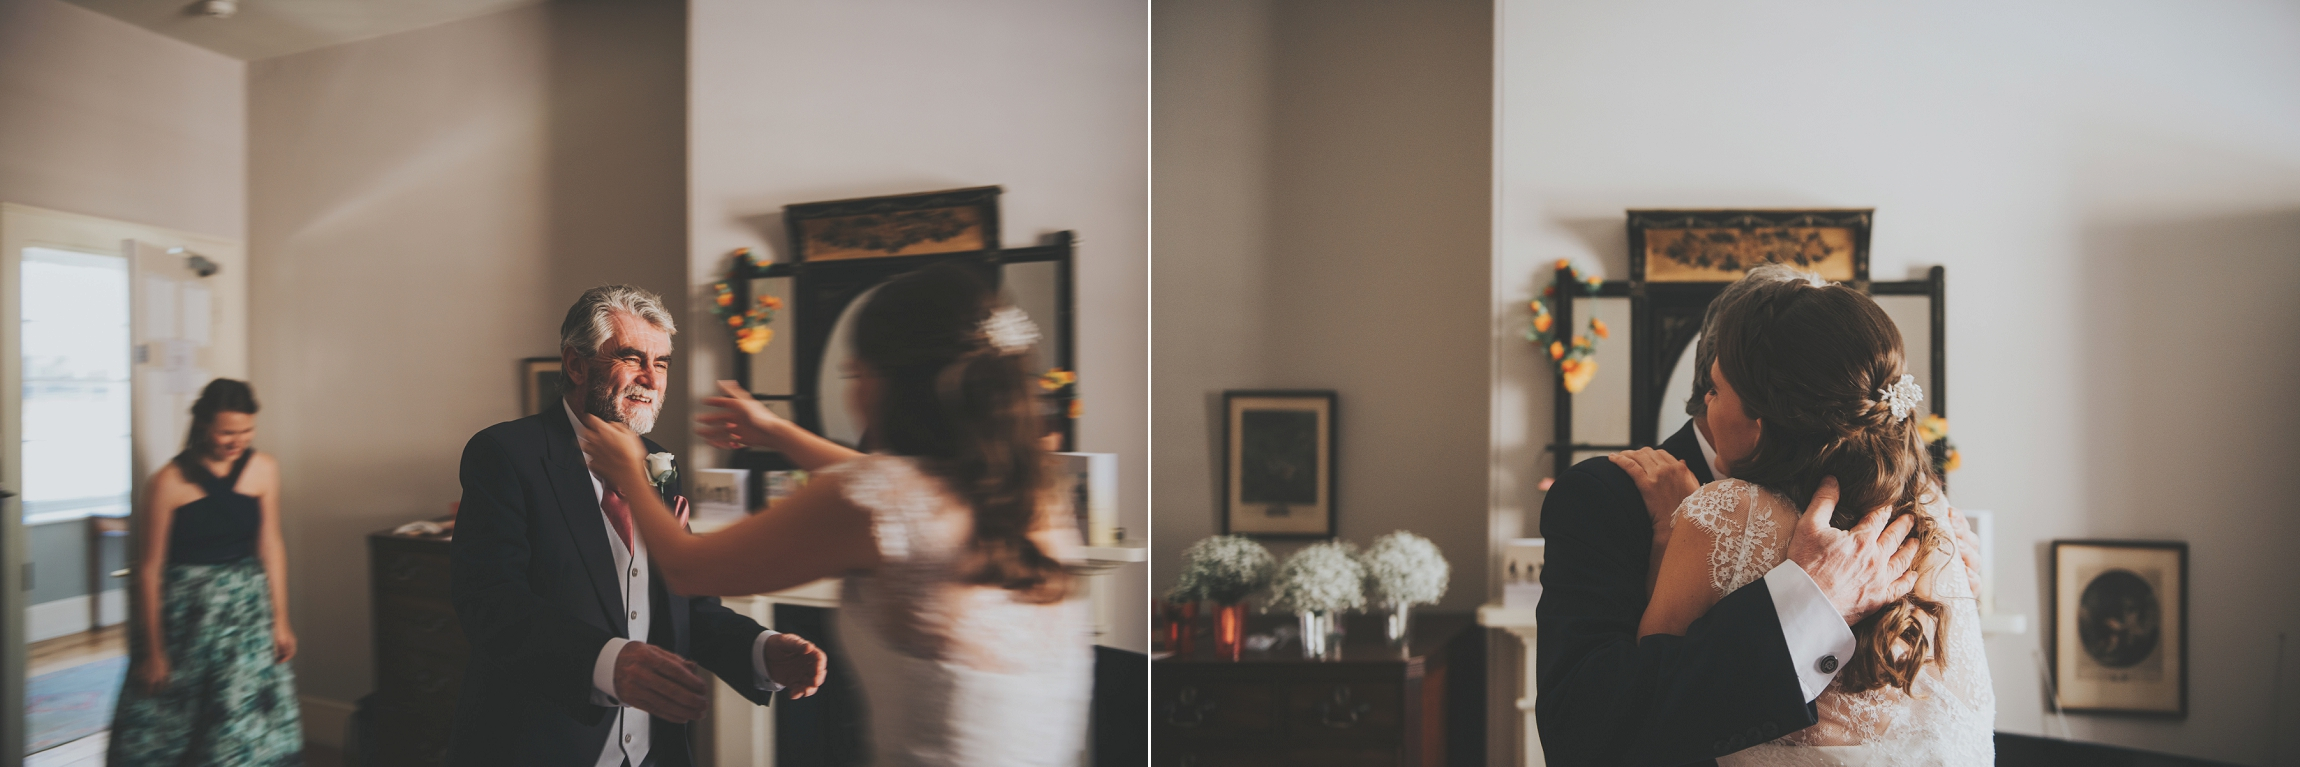 Oxford-Wedding-Photographer_0003.jpg